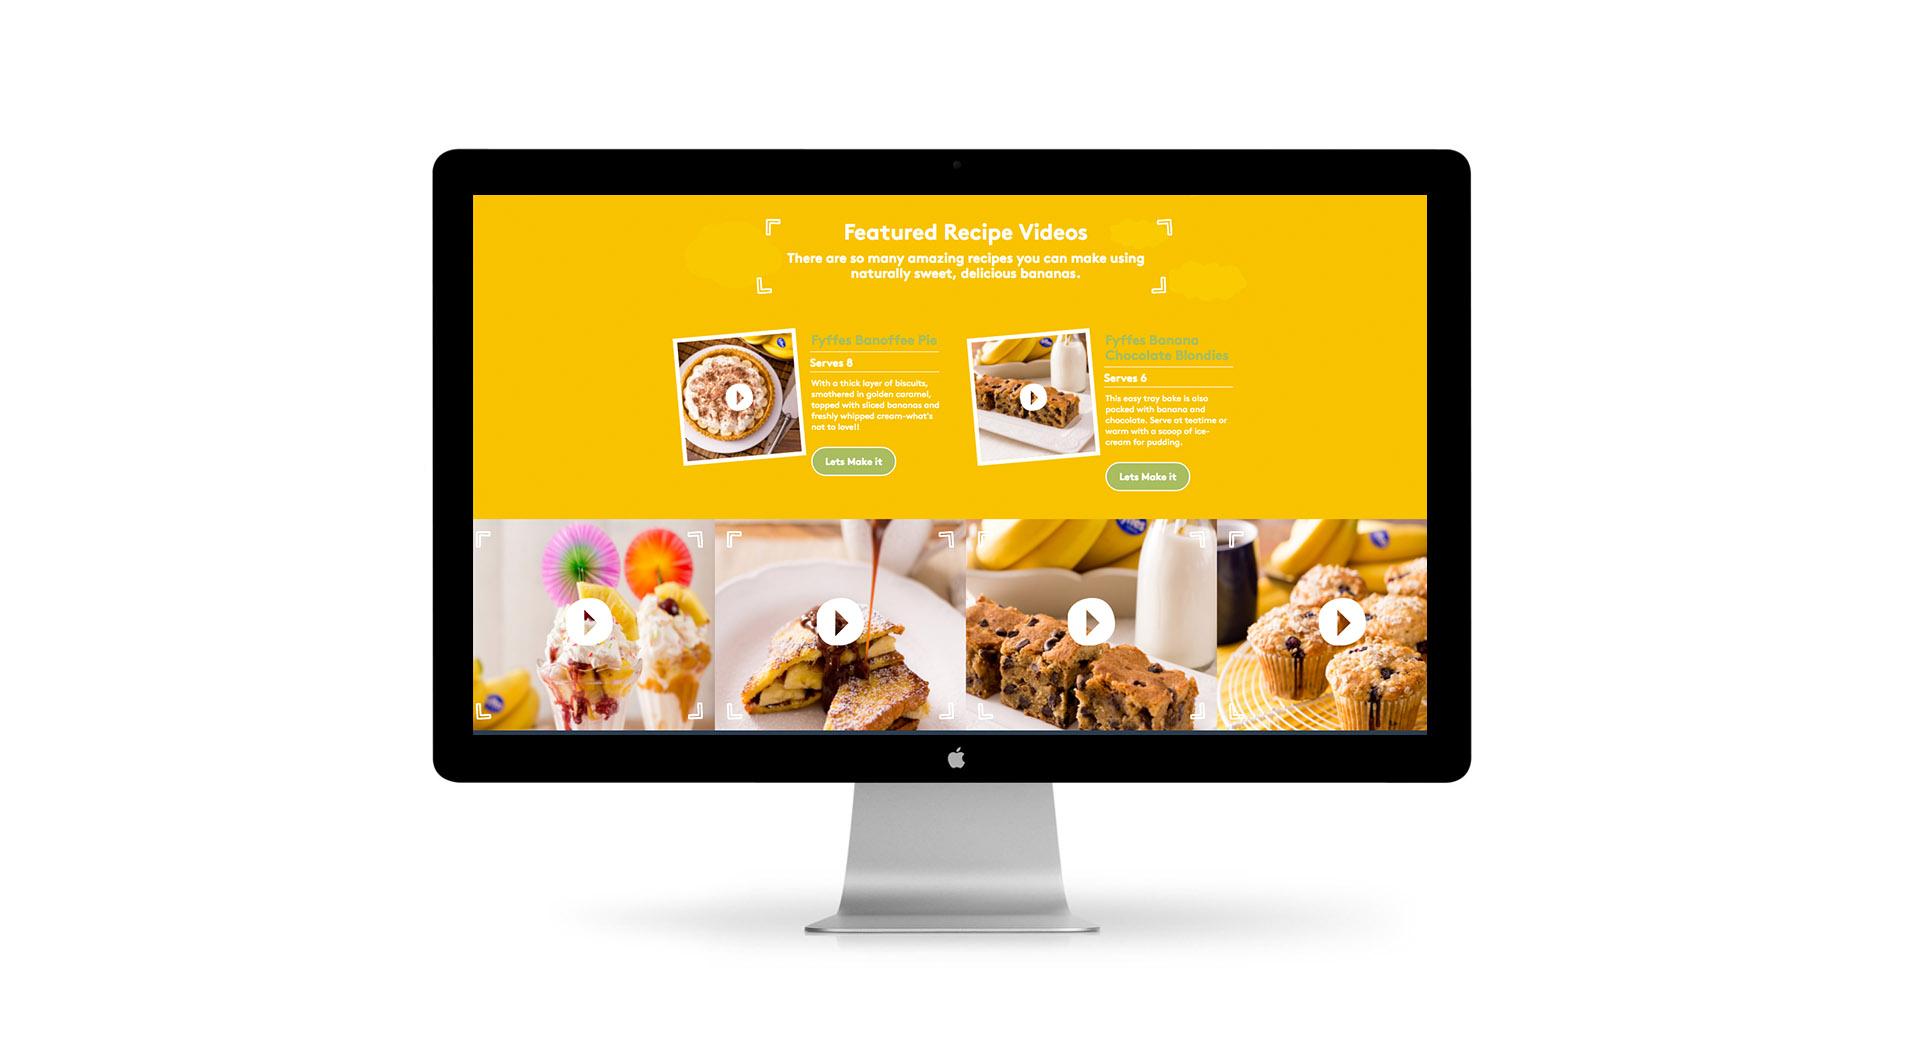 Freddy Fyffes Website Design Freddy Fyffes Freddy Fyffes Website Lets Get Cooking.